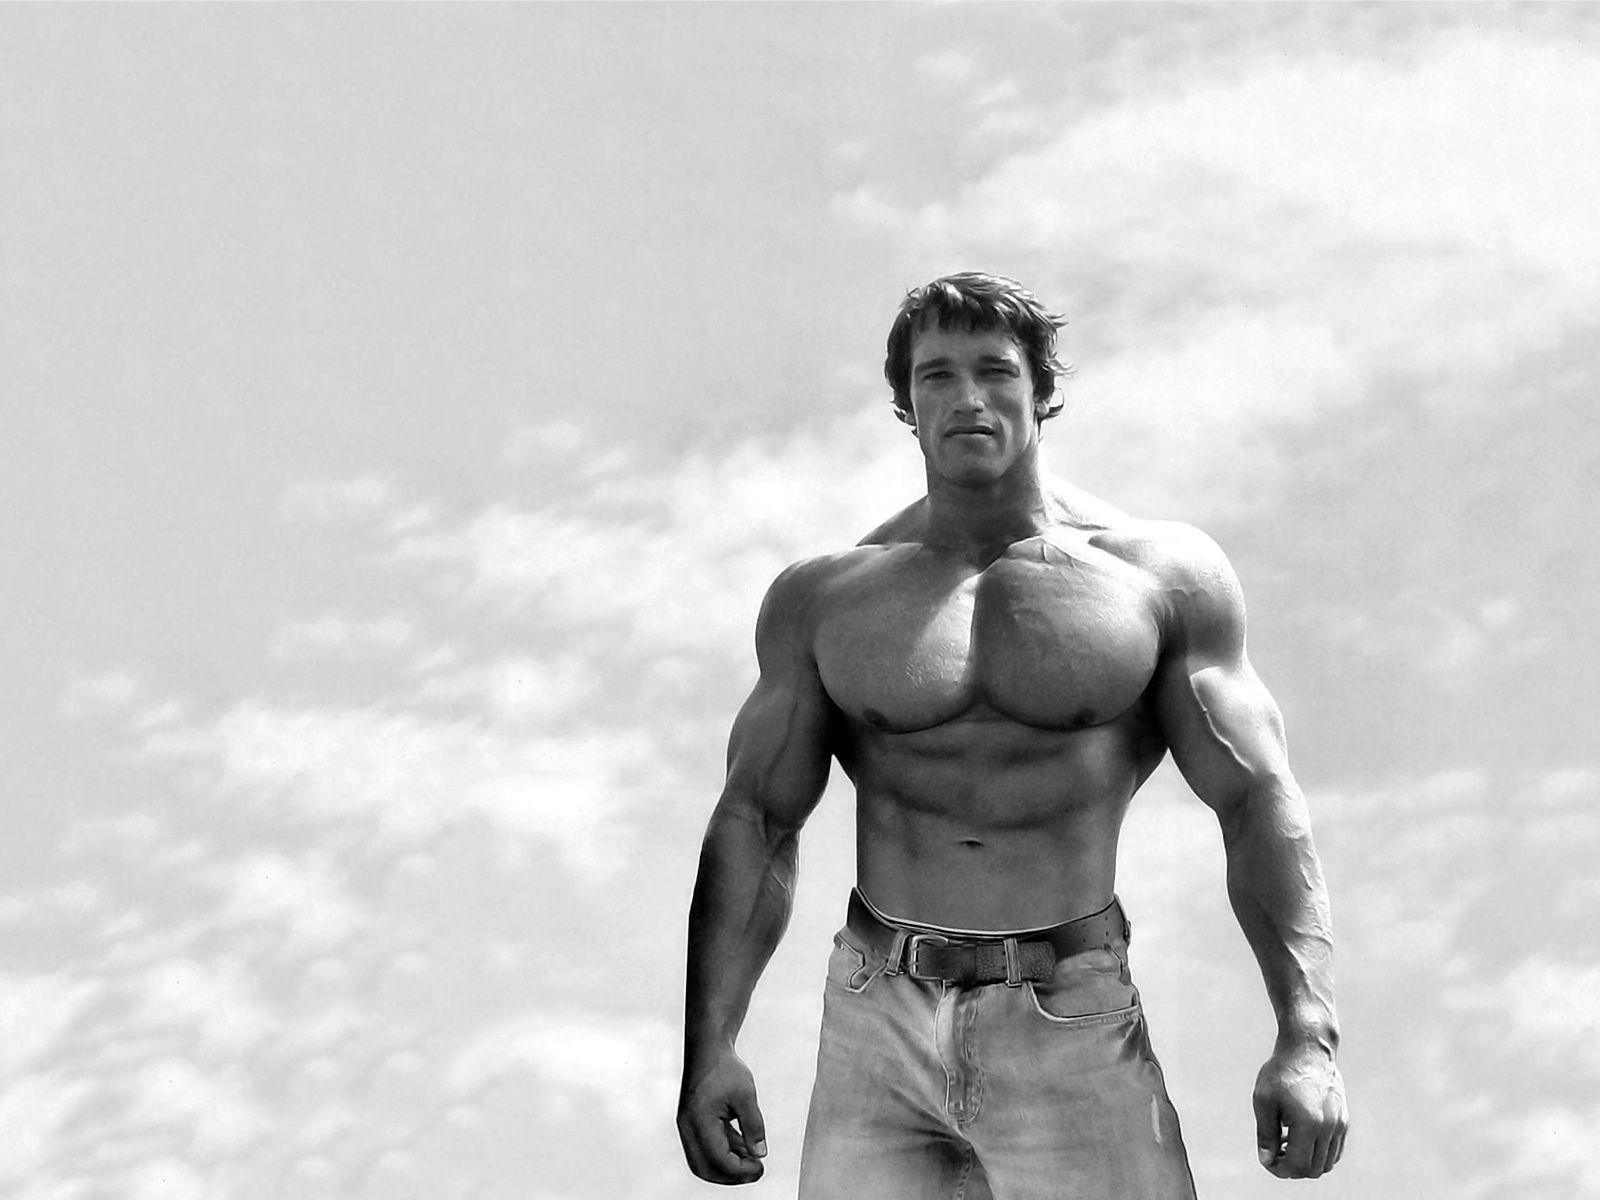 The Rapping Manual Arnold Schwarzenegger Bodybuilding